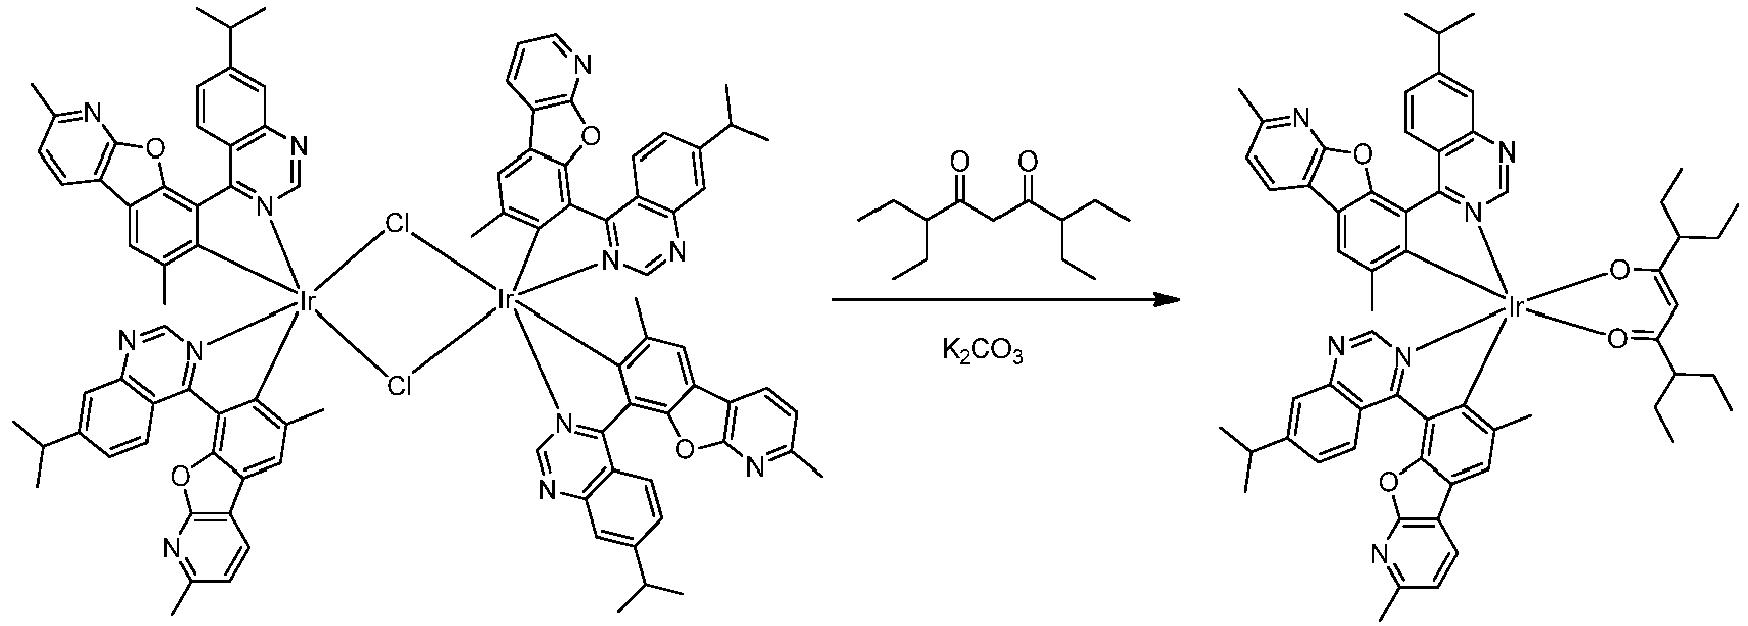 Figure imgb0310